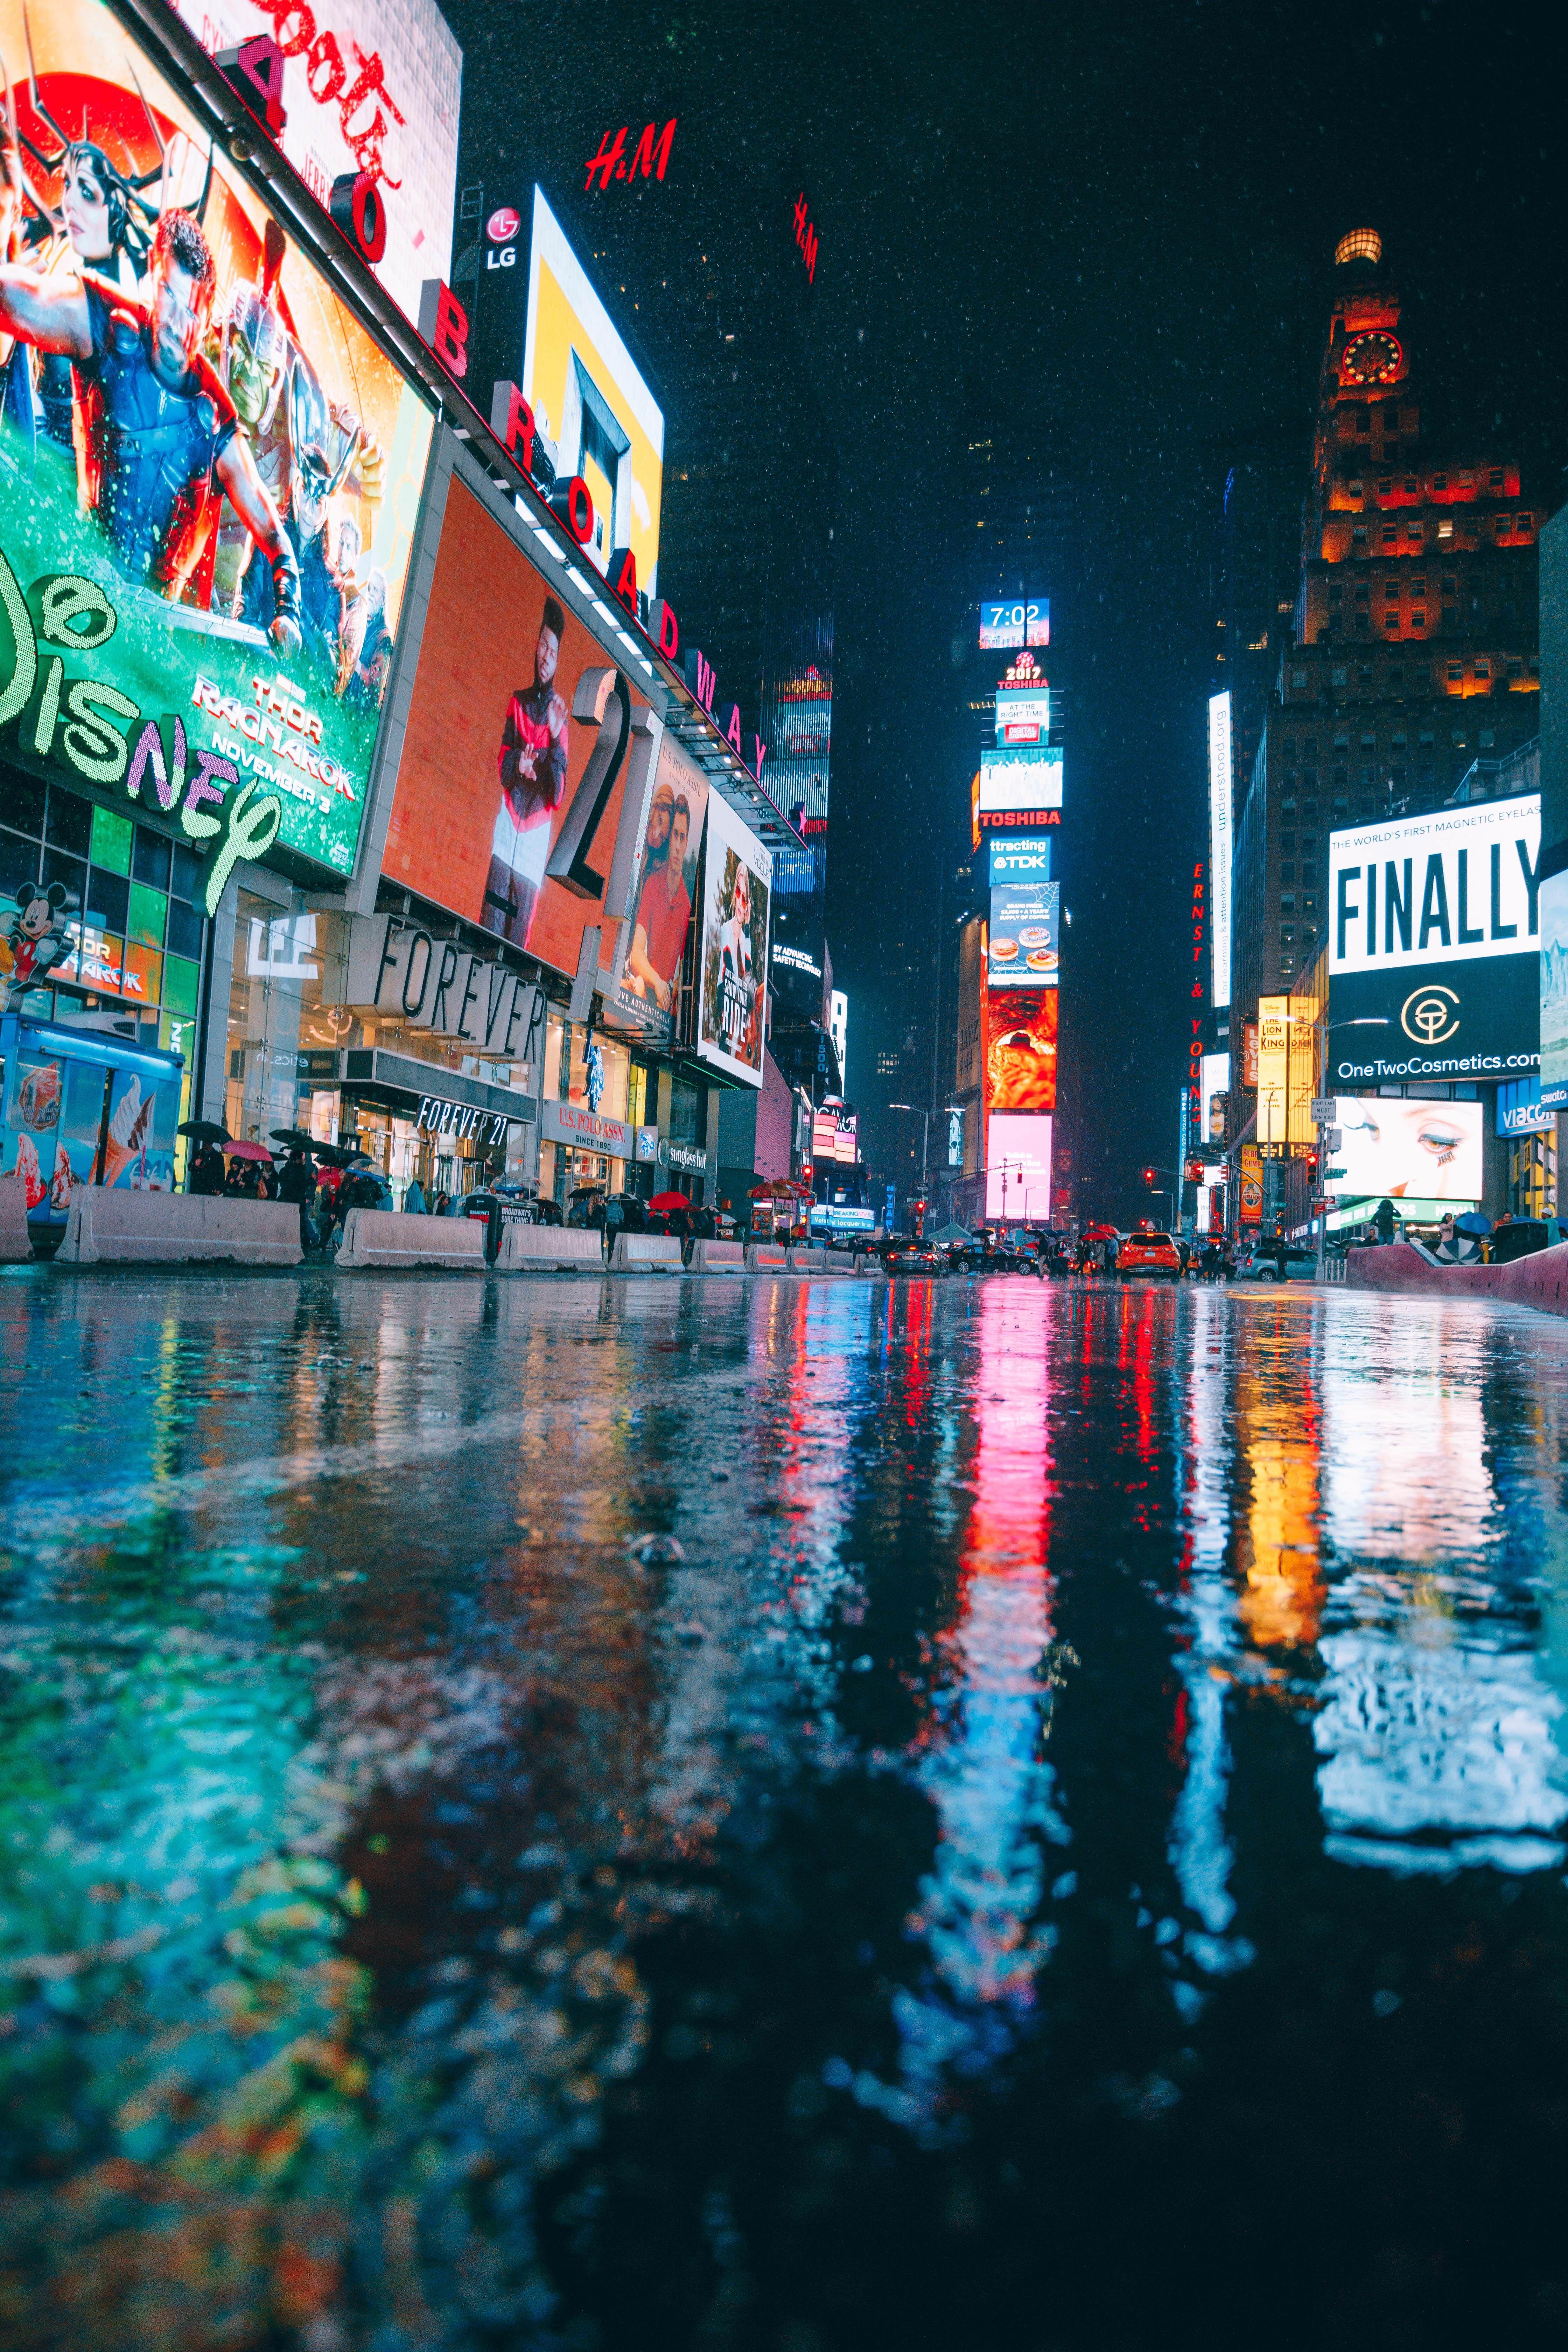 Rainy Times Square Nyc 4480x6720 Oc Nyc Times Square Times Square New York Wallpaper